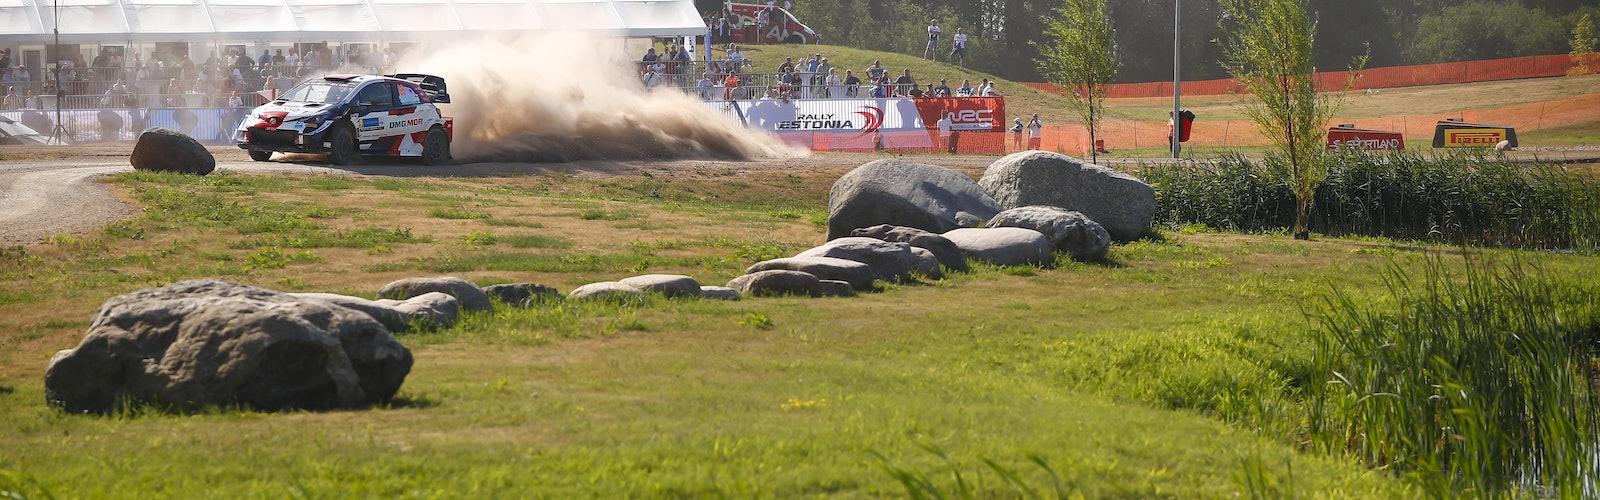 WRC_2021_Rd.7_327